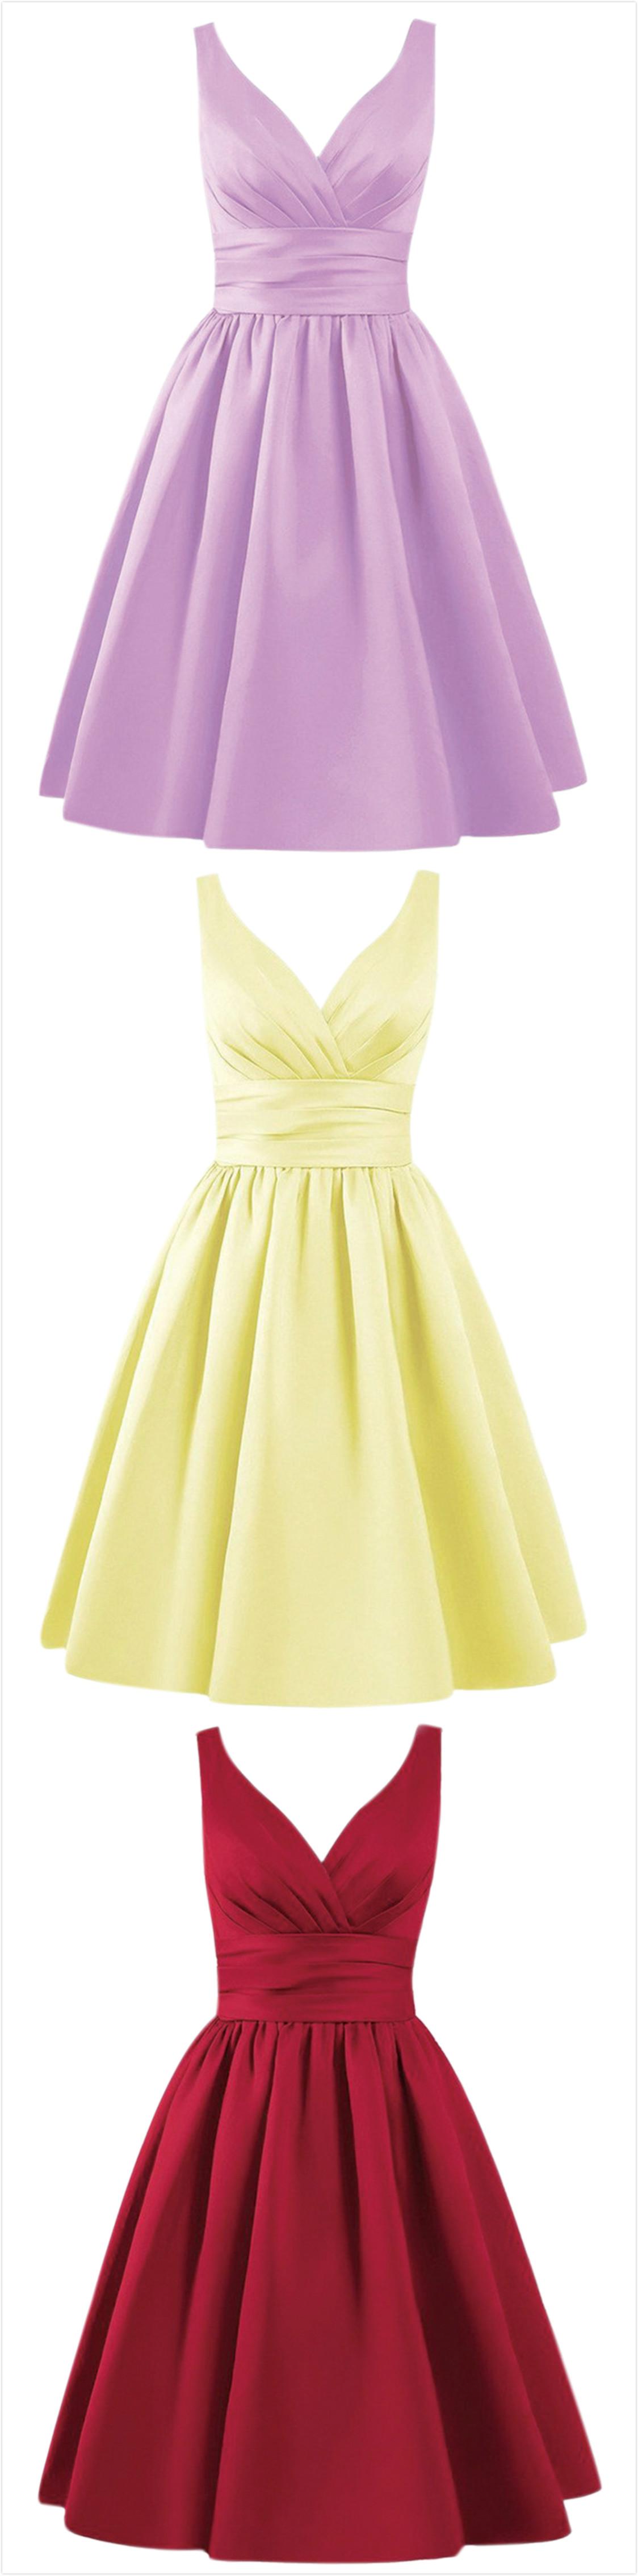 Pin by obhed salem on us fashion pinterest dresses